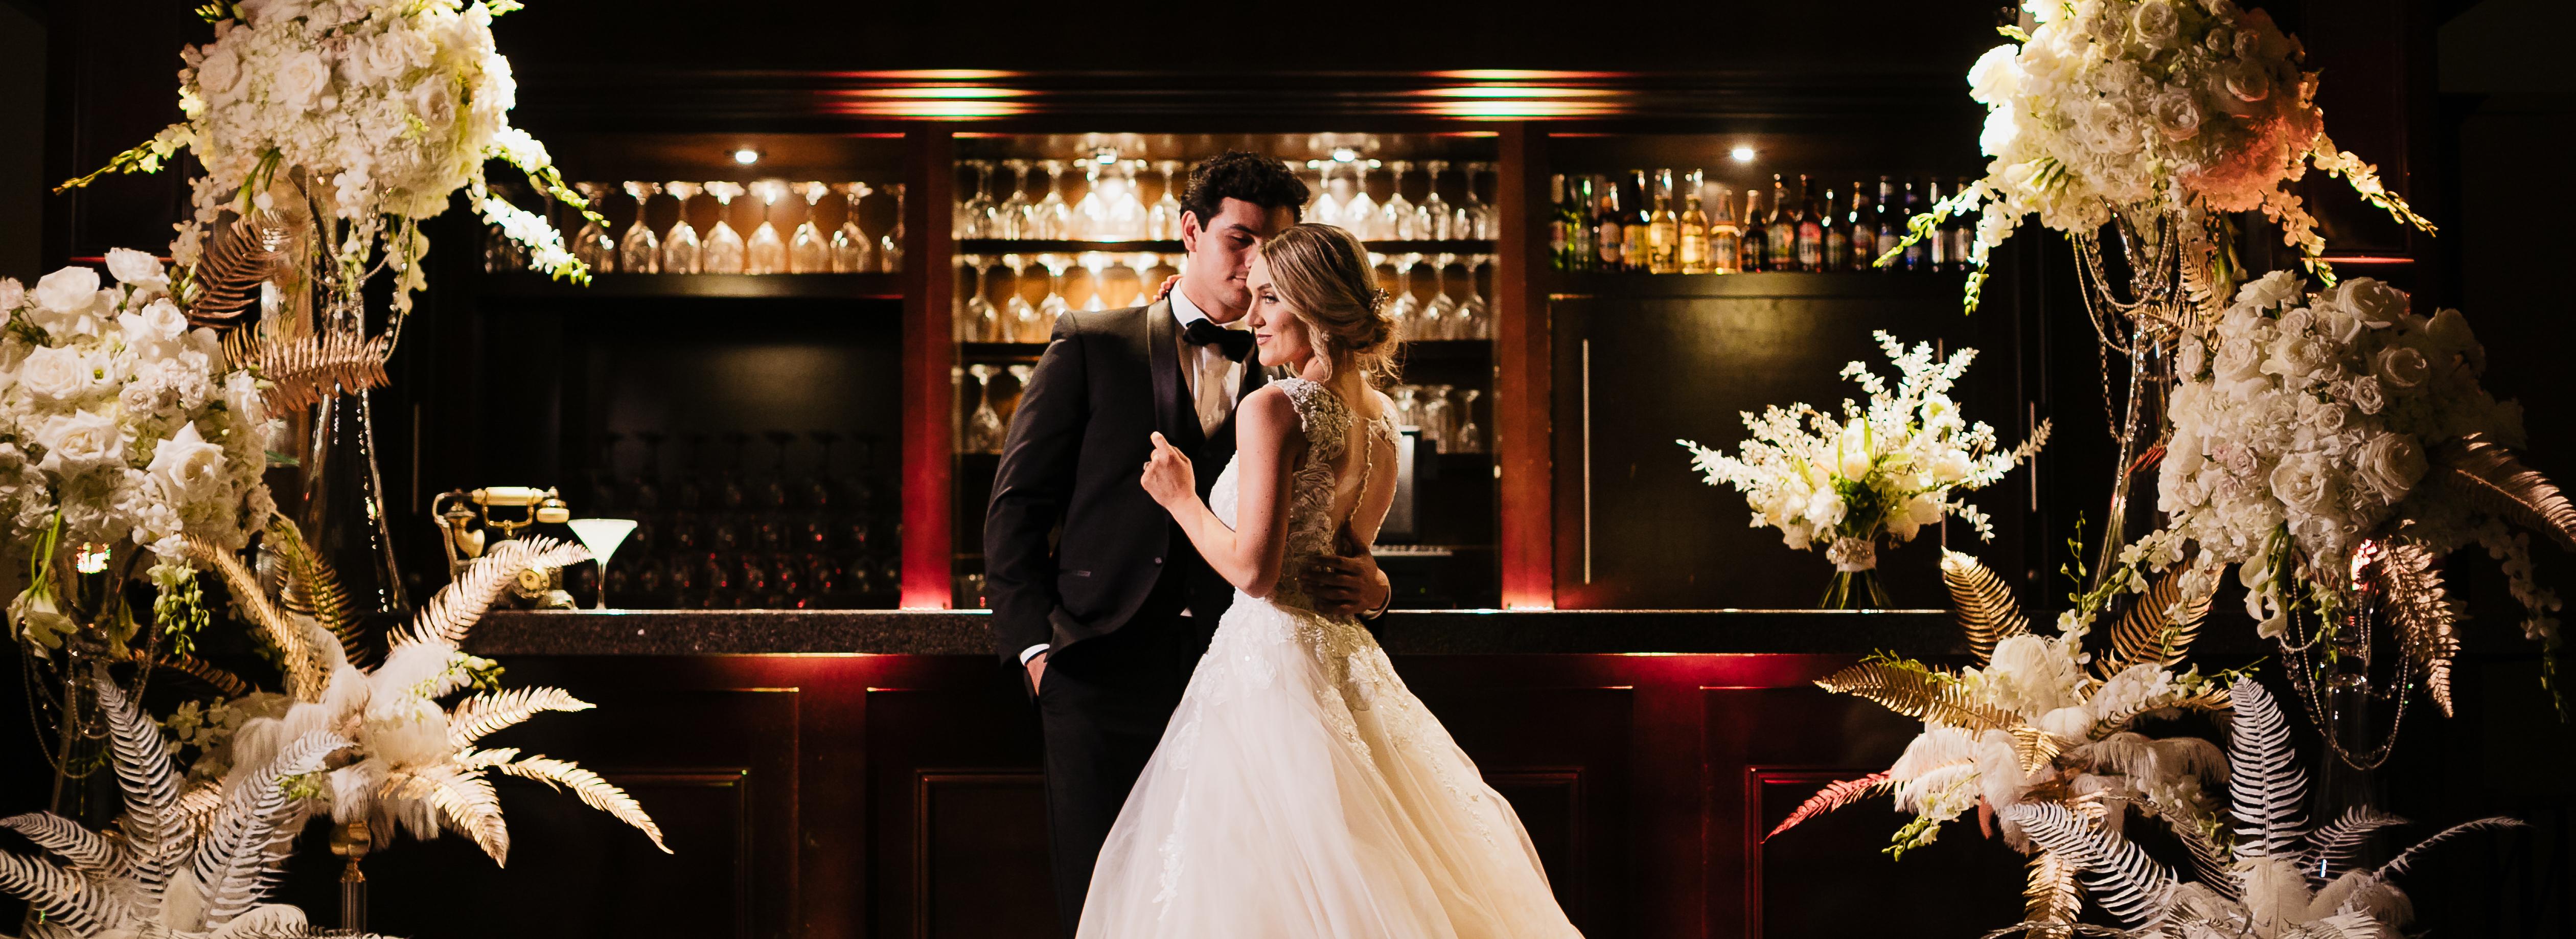 1de4a9f0e2 Huntington Beach Wedding Venues at SeaCliff Country Club | CC Receptions